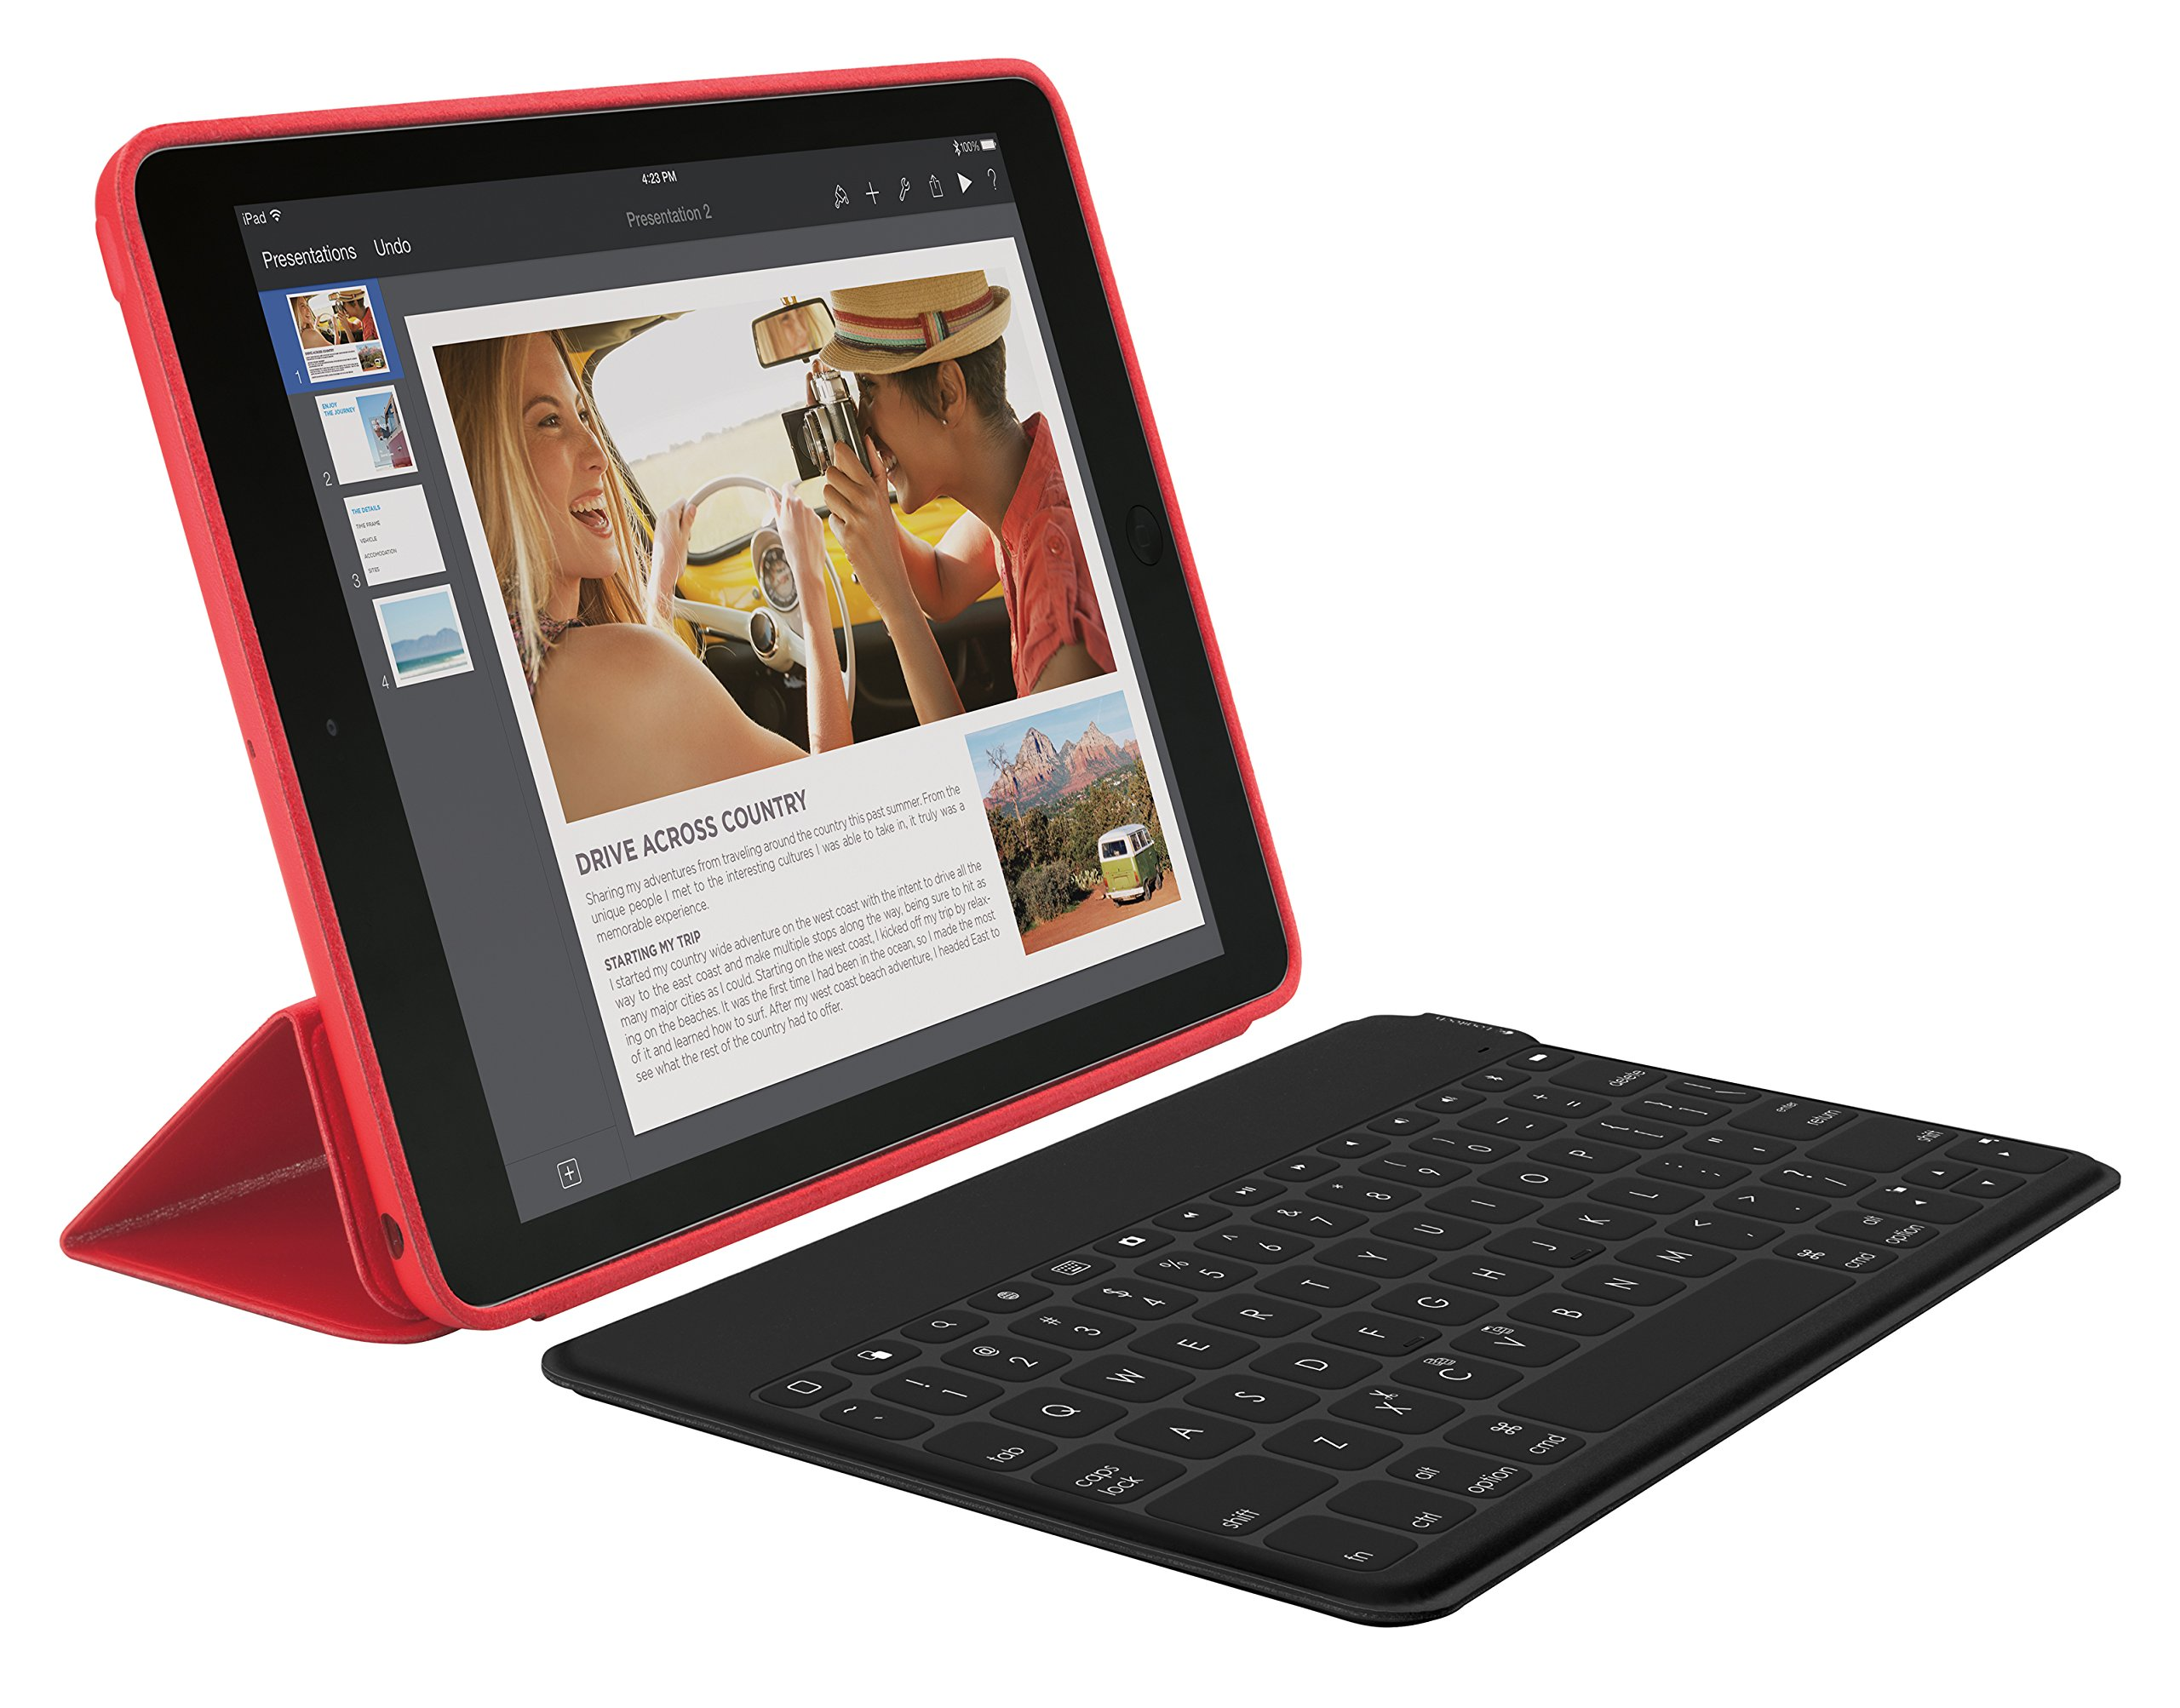 LOG920006701 - LOGITECH, INC. Logitech Keys-to-Go Ultra-Portable, Stand-Alone Keyboard by Logitech (Image #2)